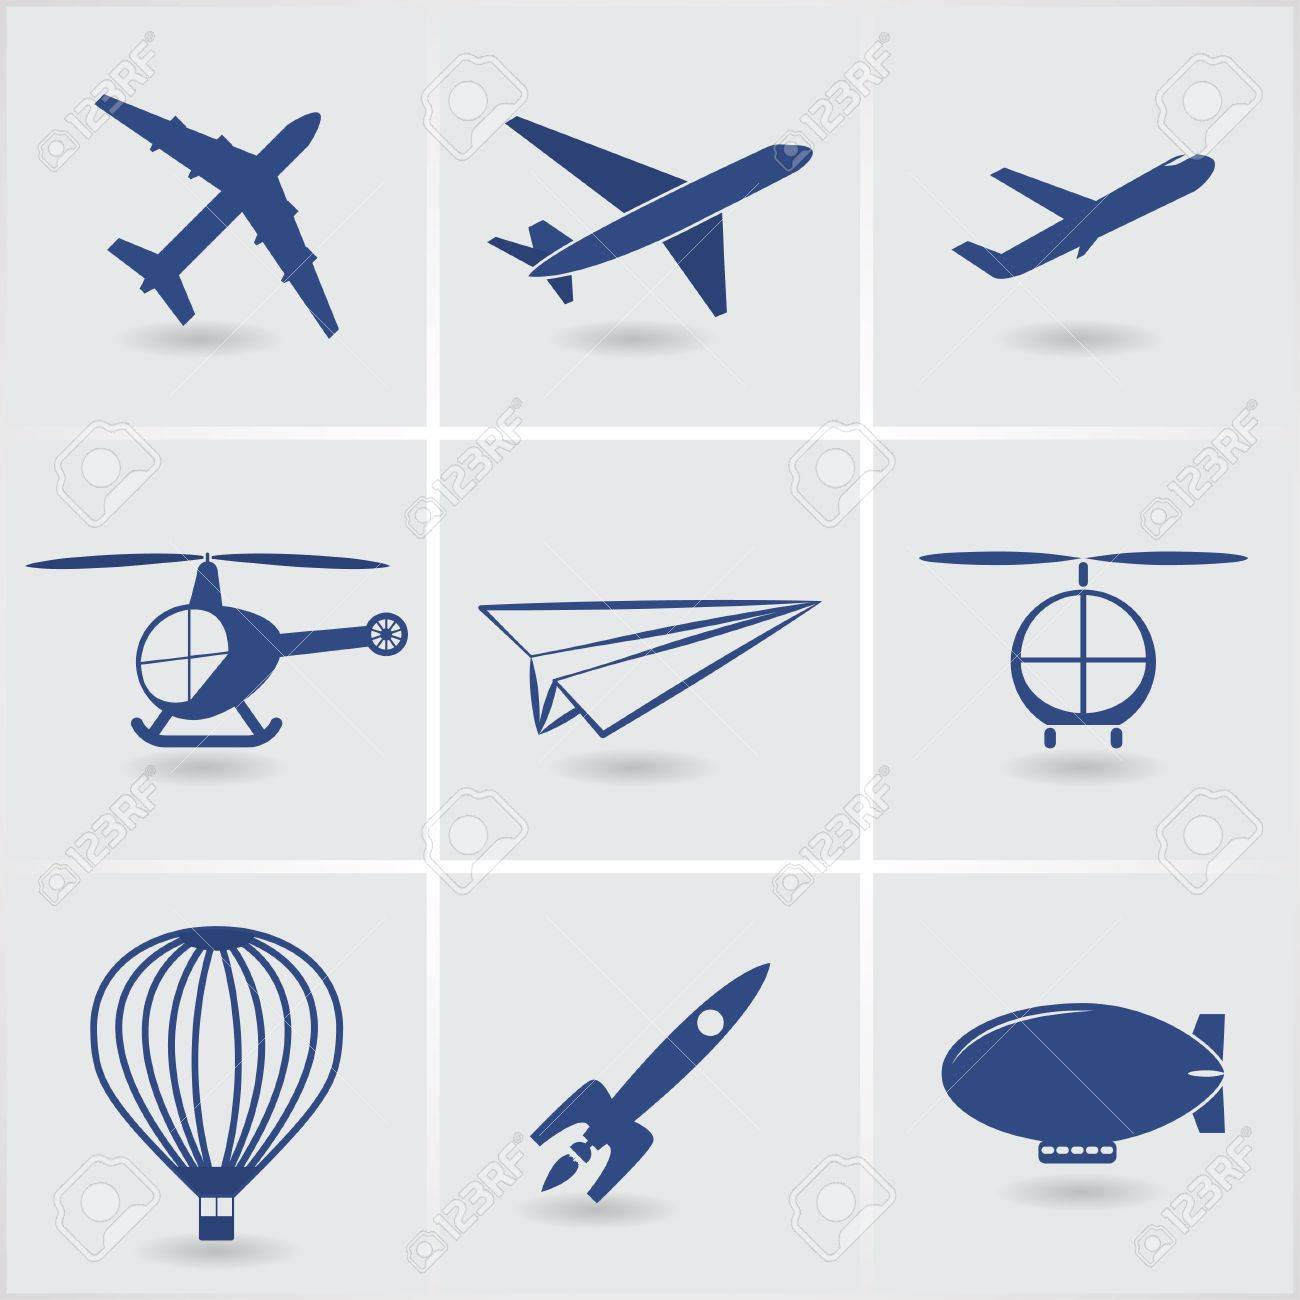 air transport. Stock Vector - 21572309